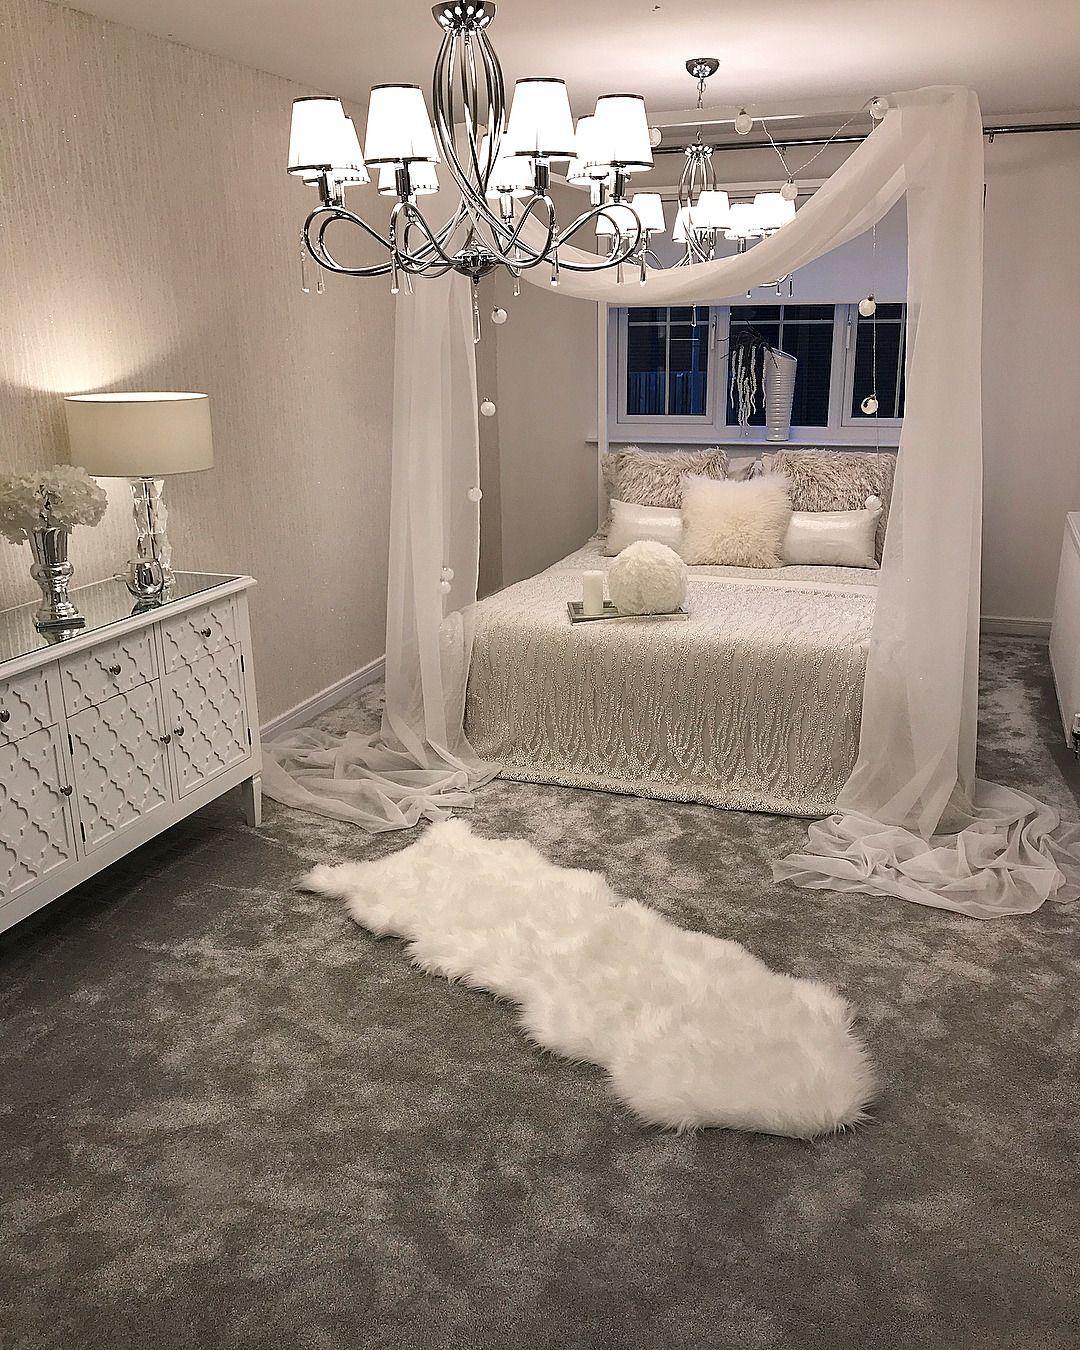 #interior #bed #fur #luxury #lavish #rich   Minimalist ...